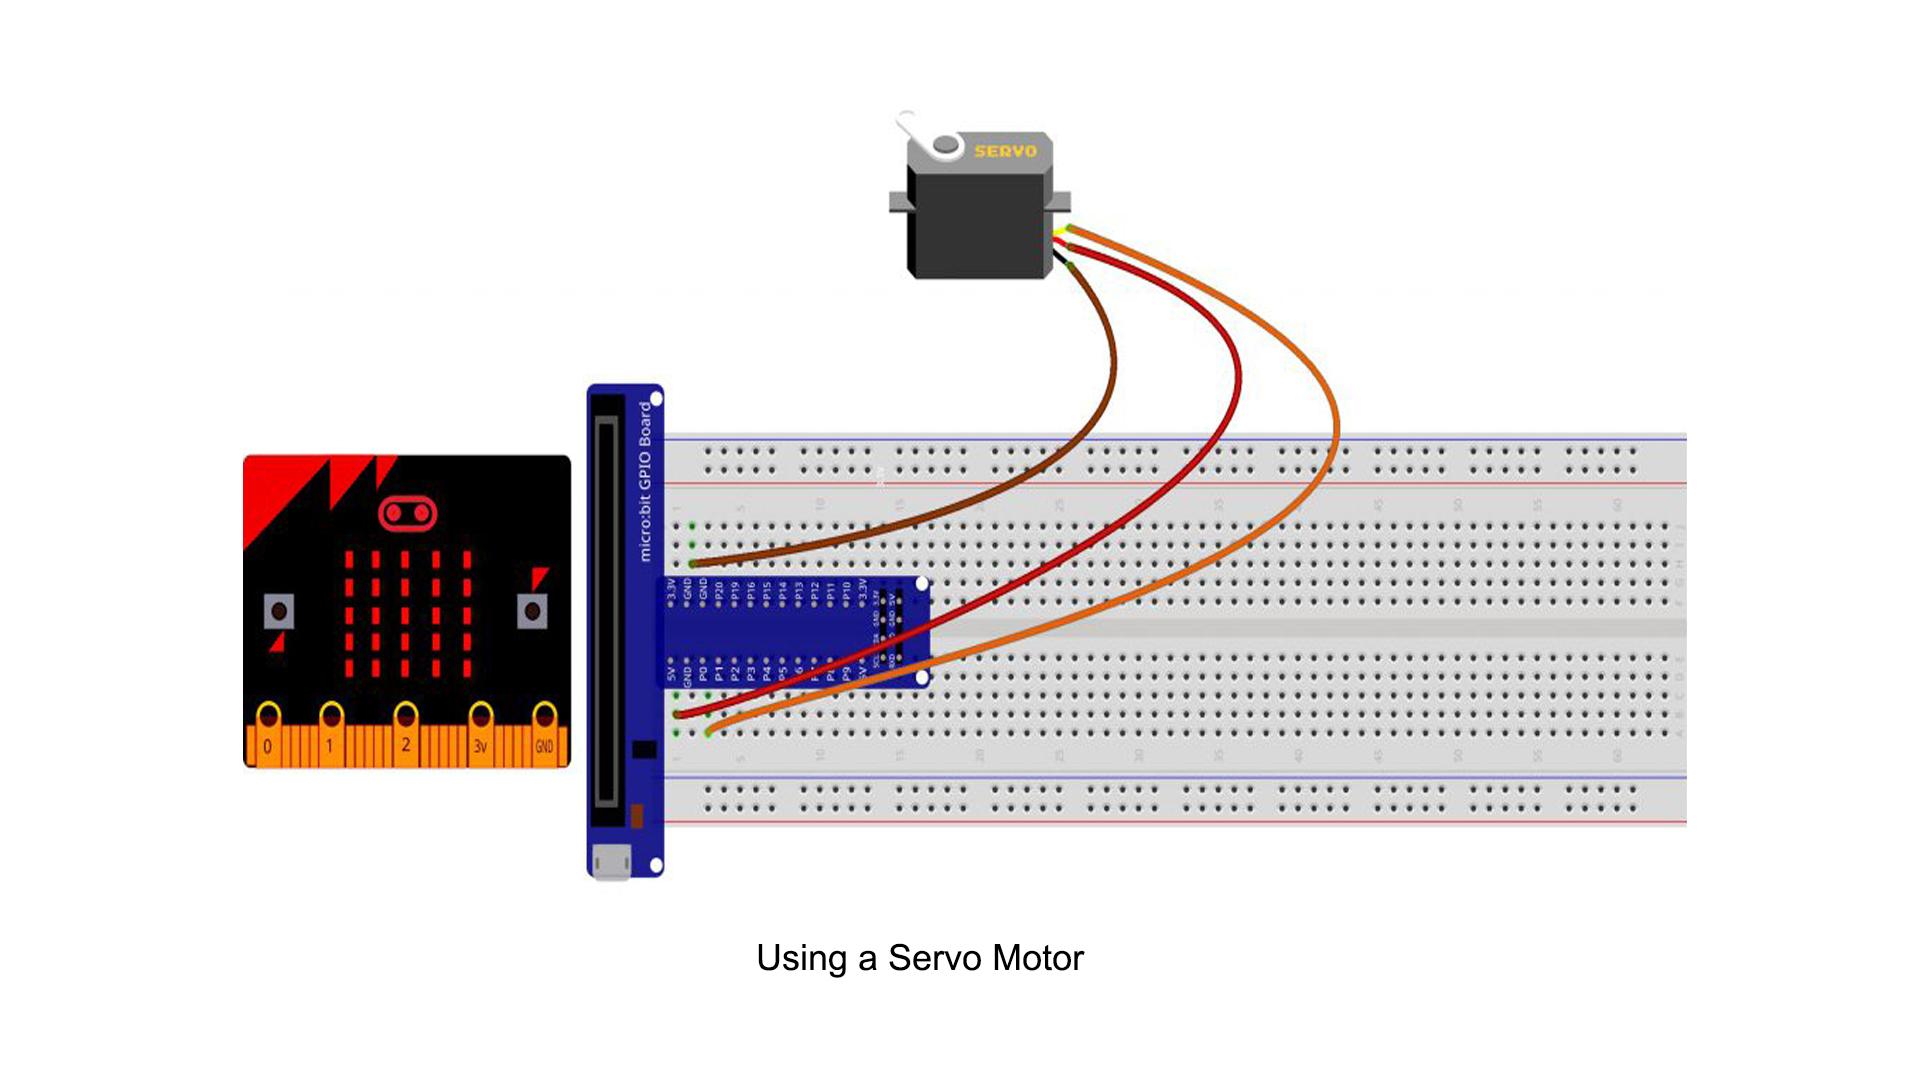 Micro bit lesson — Using a Servo Motor